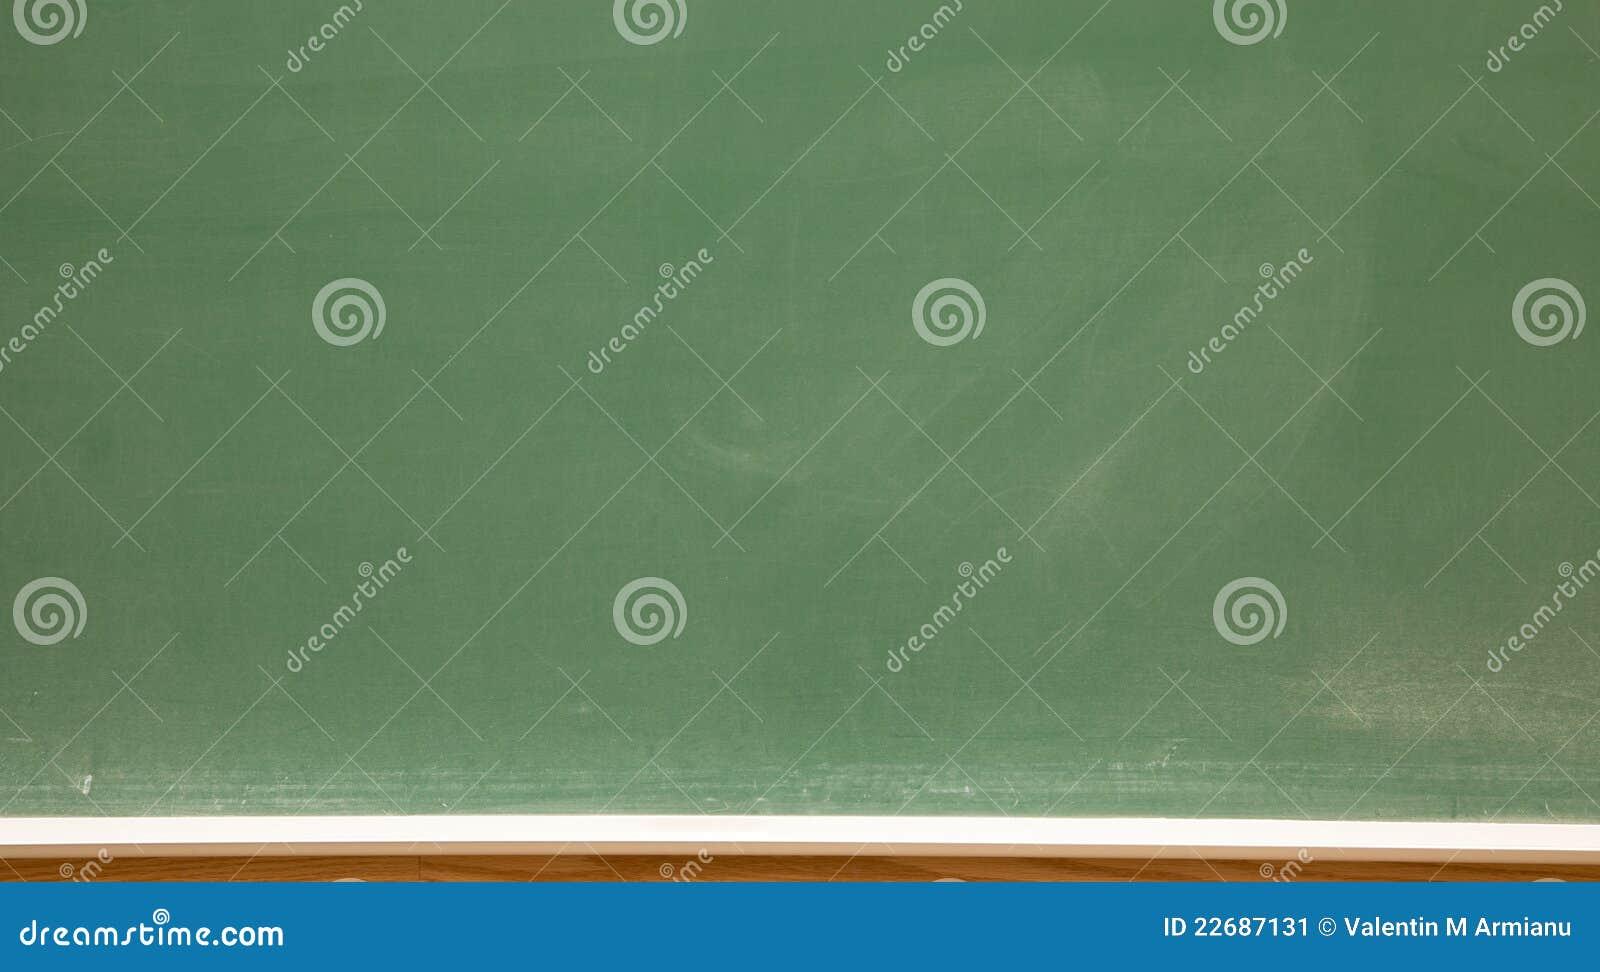 Pizarra de la sala de clase